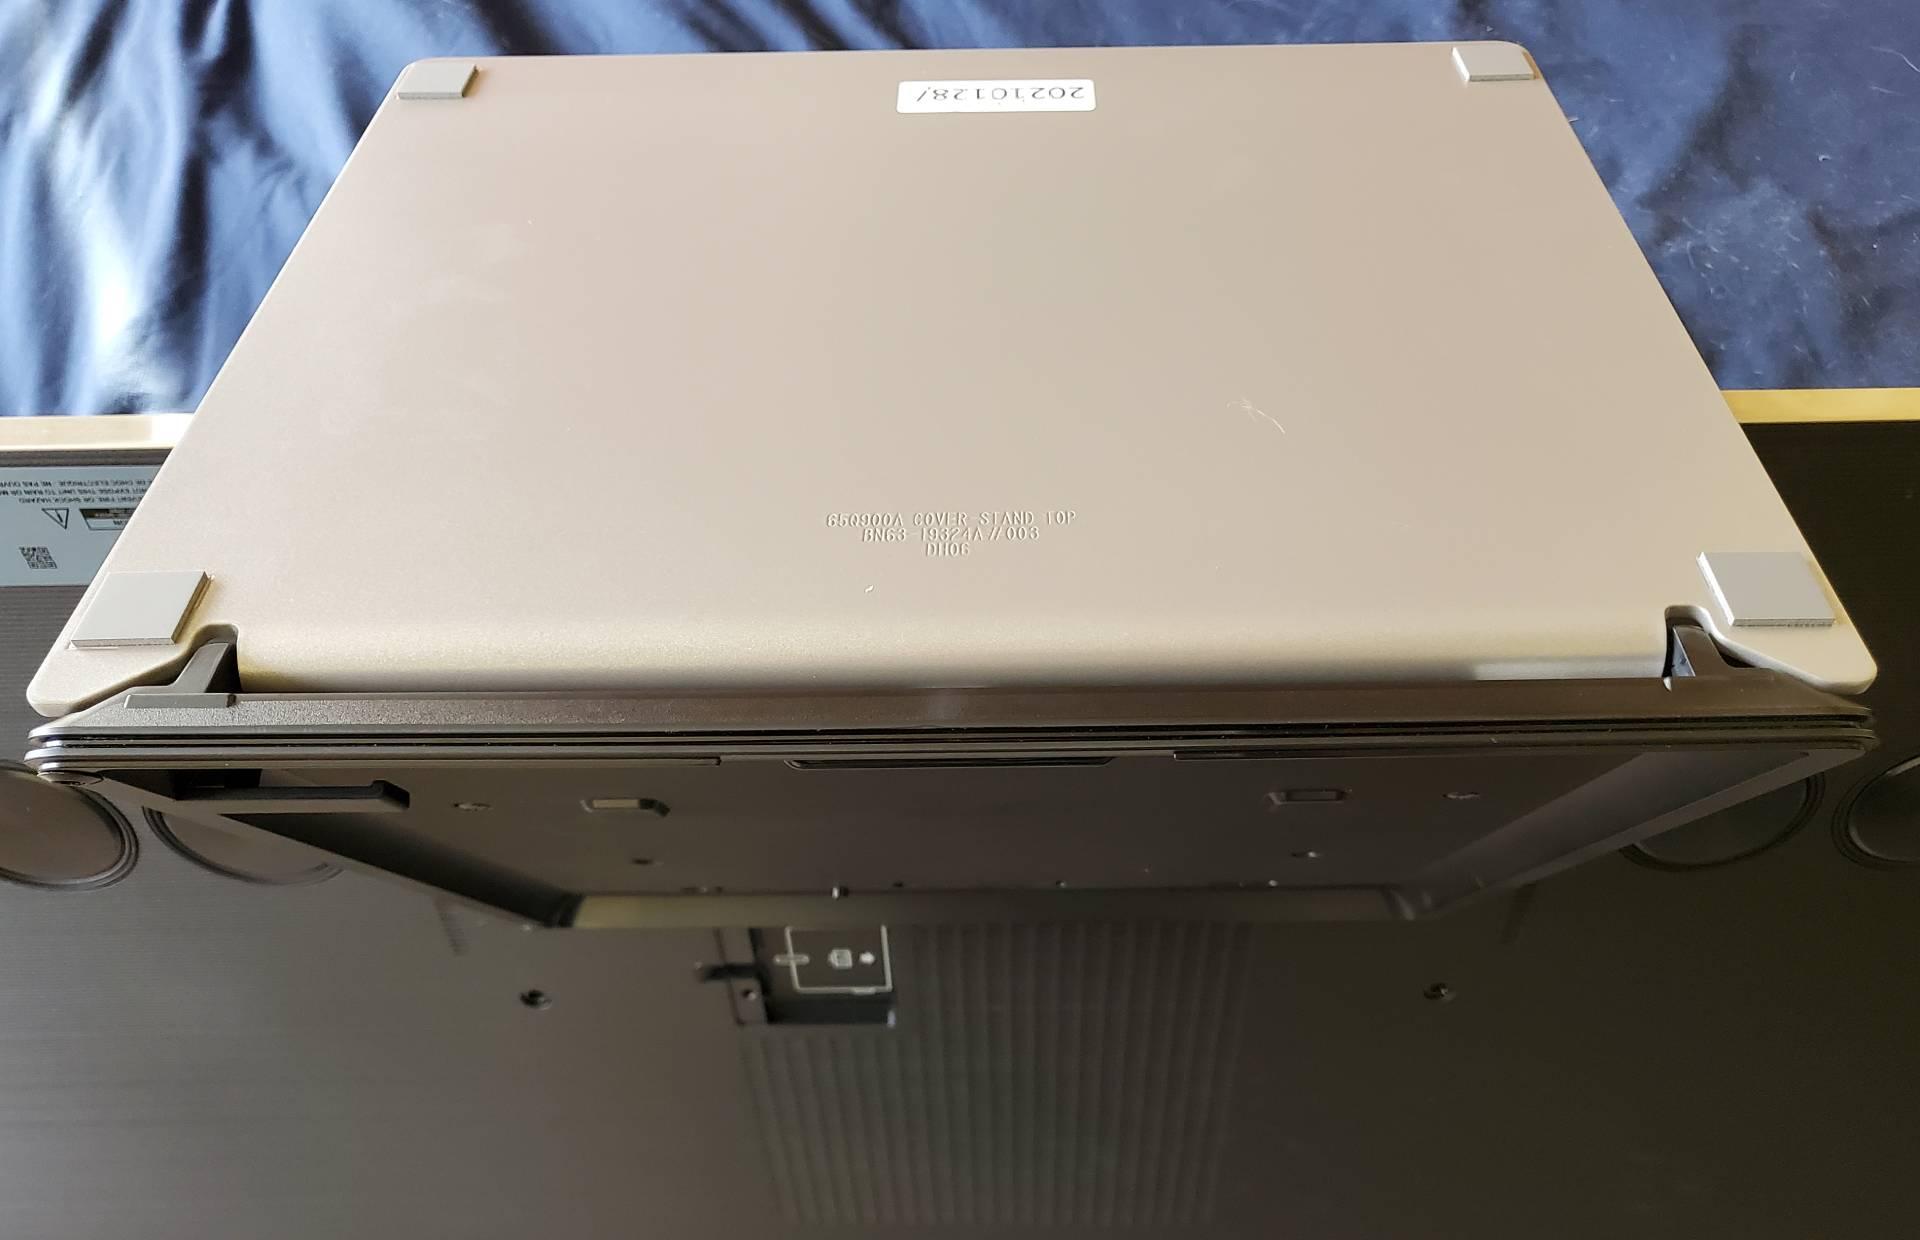 Samsung Neo QLED QN900A8K 65 inch Smart TV